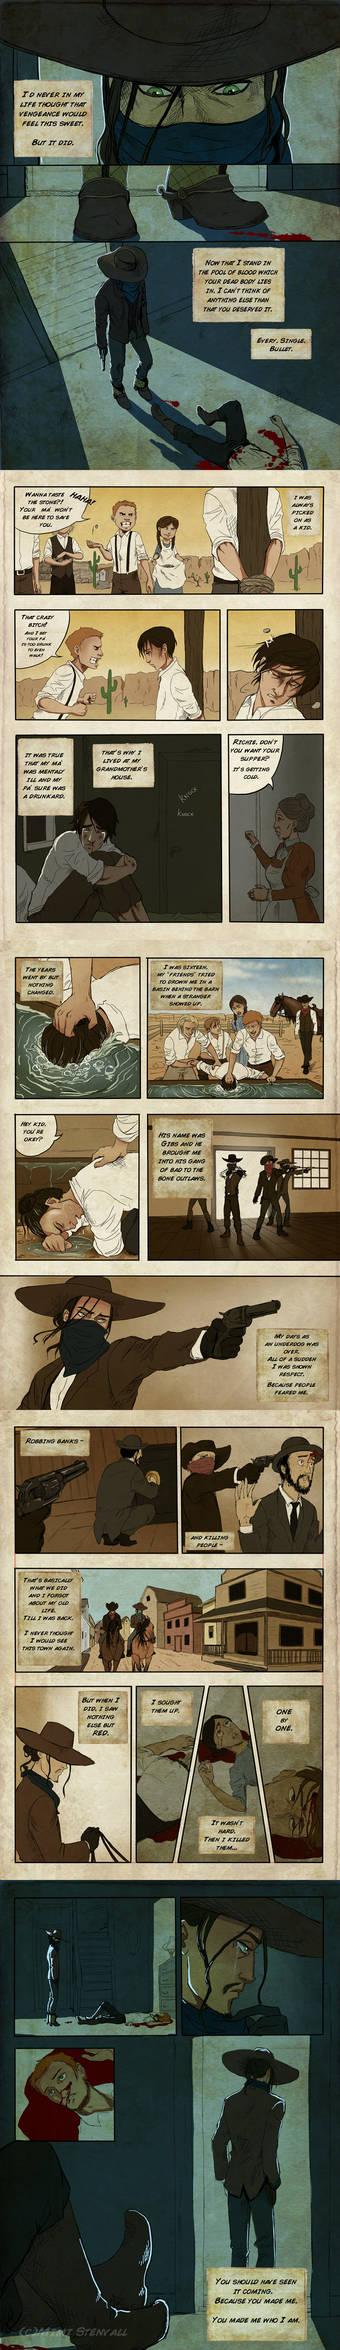 An outlaws tale